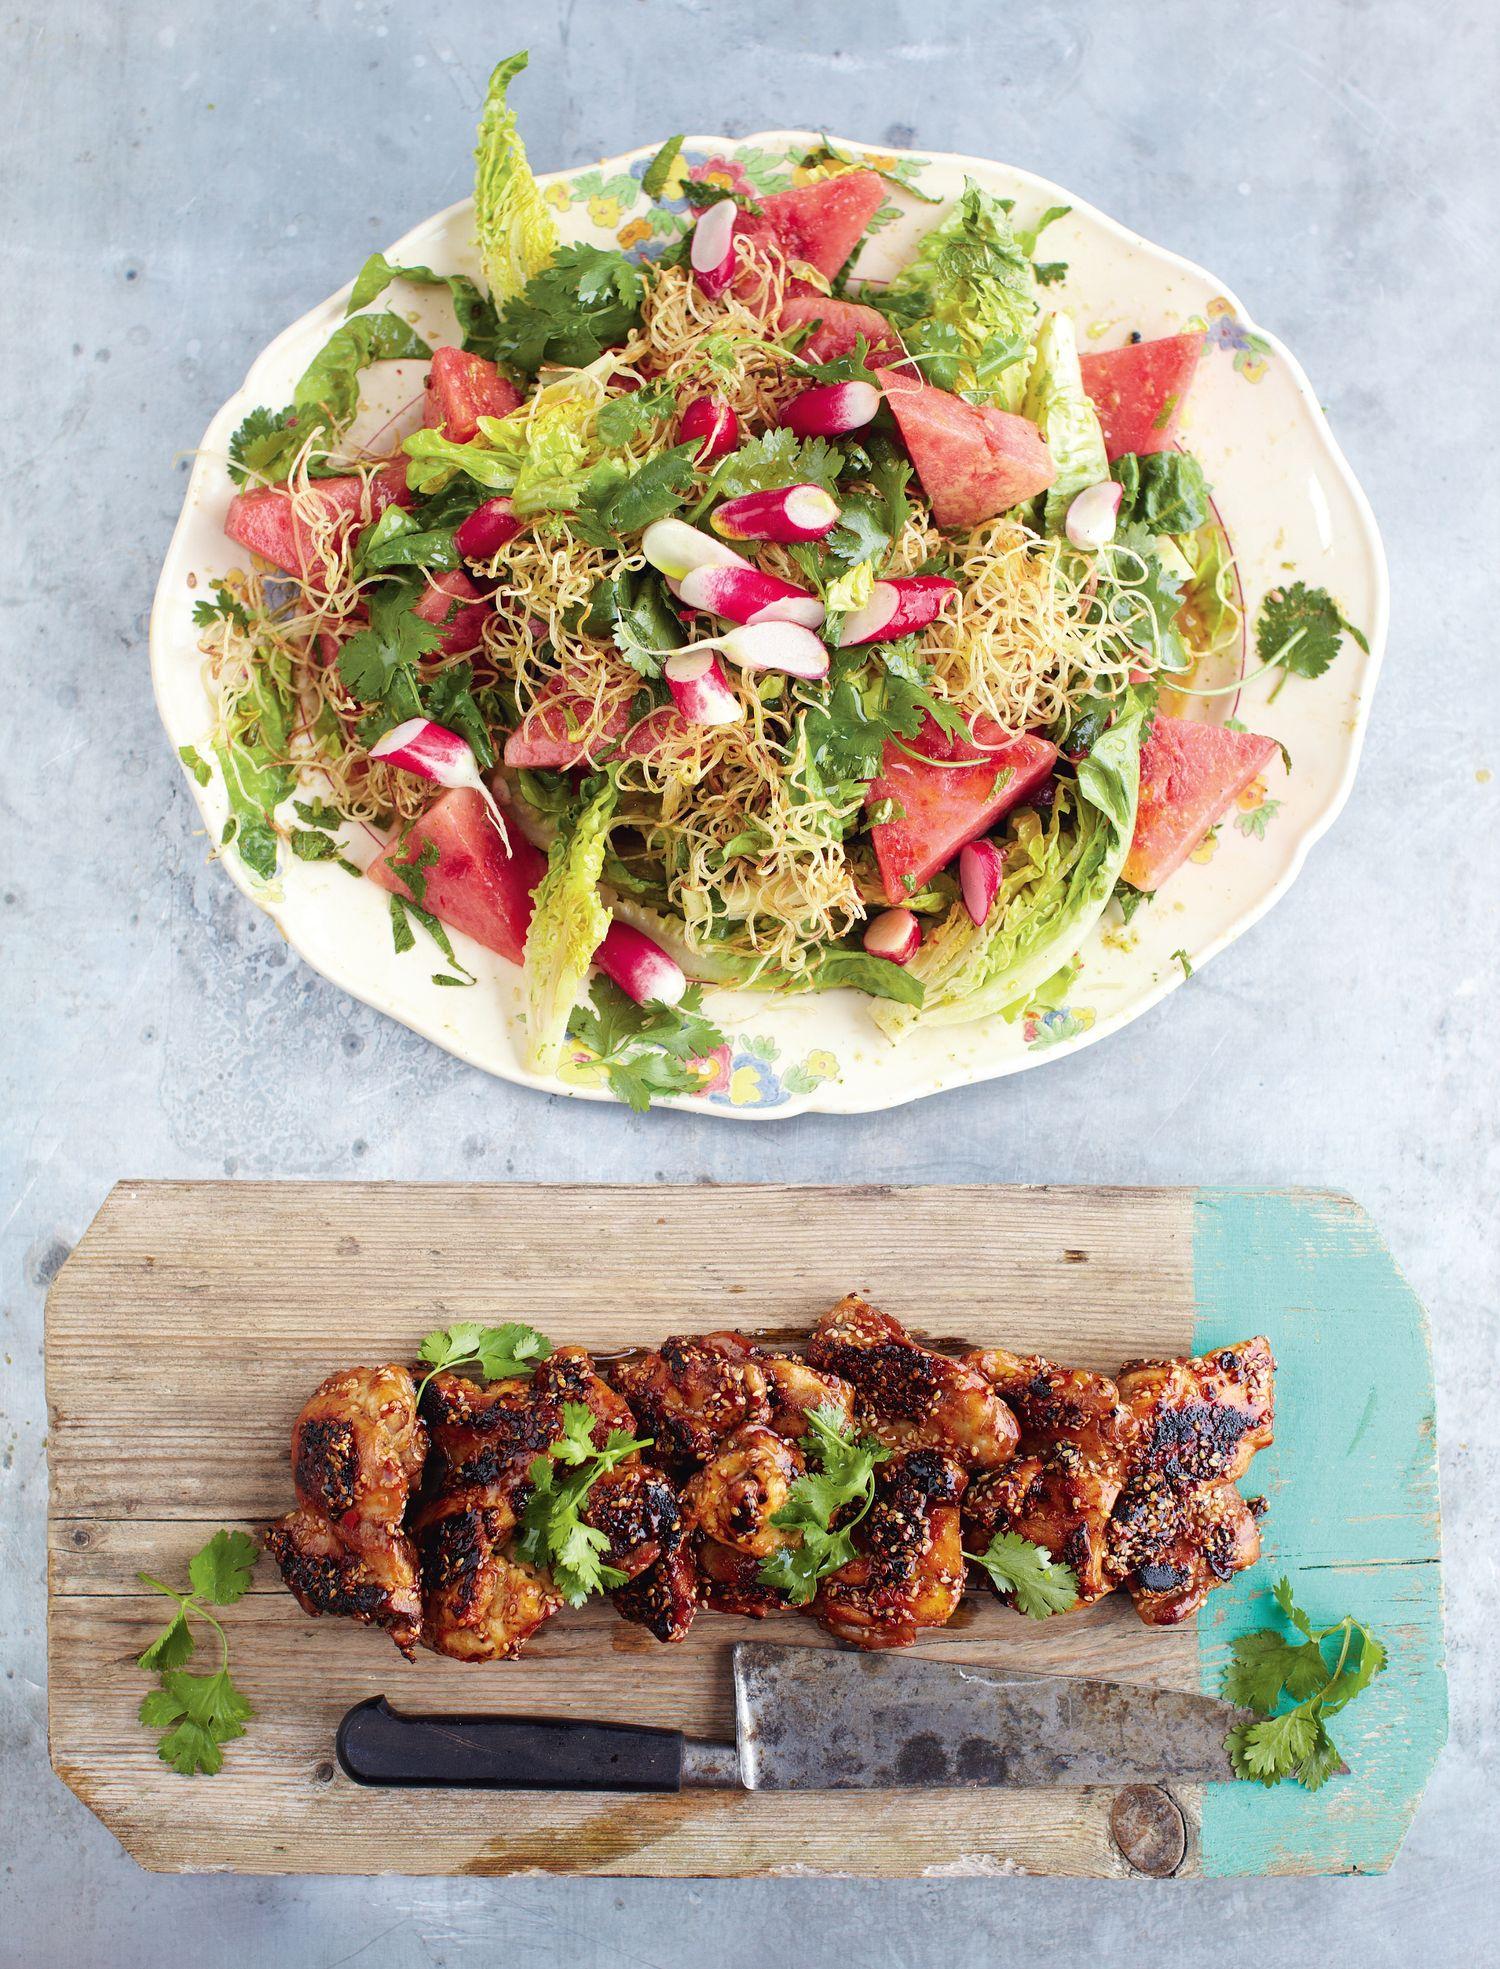 Sticky Kicking Chicken, Watermelon Radish Salad and Crunchy Noodles ...